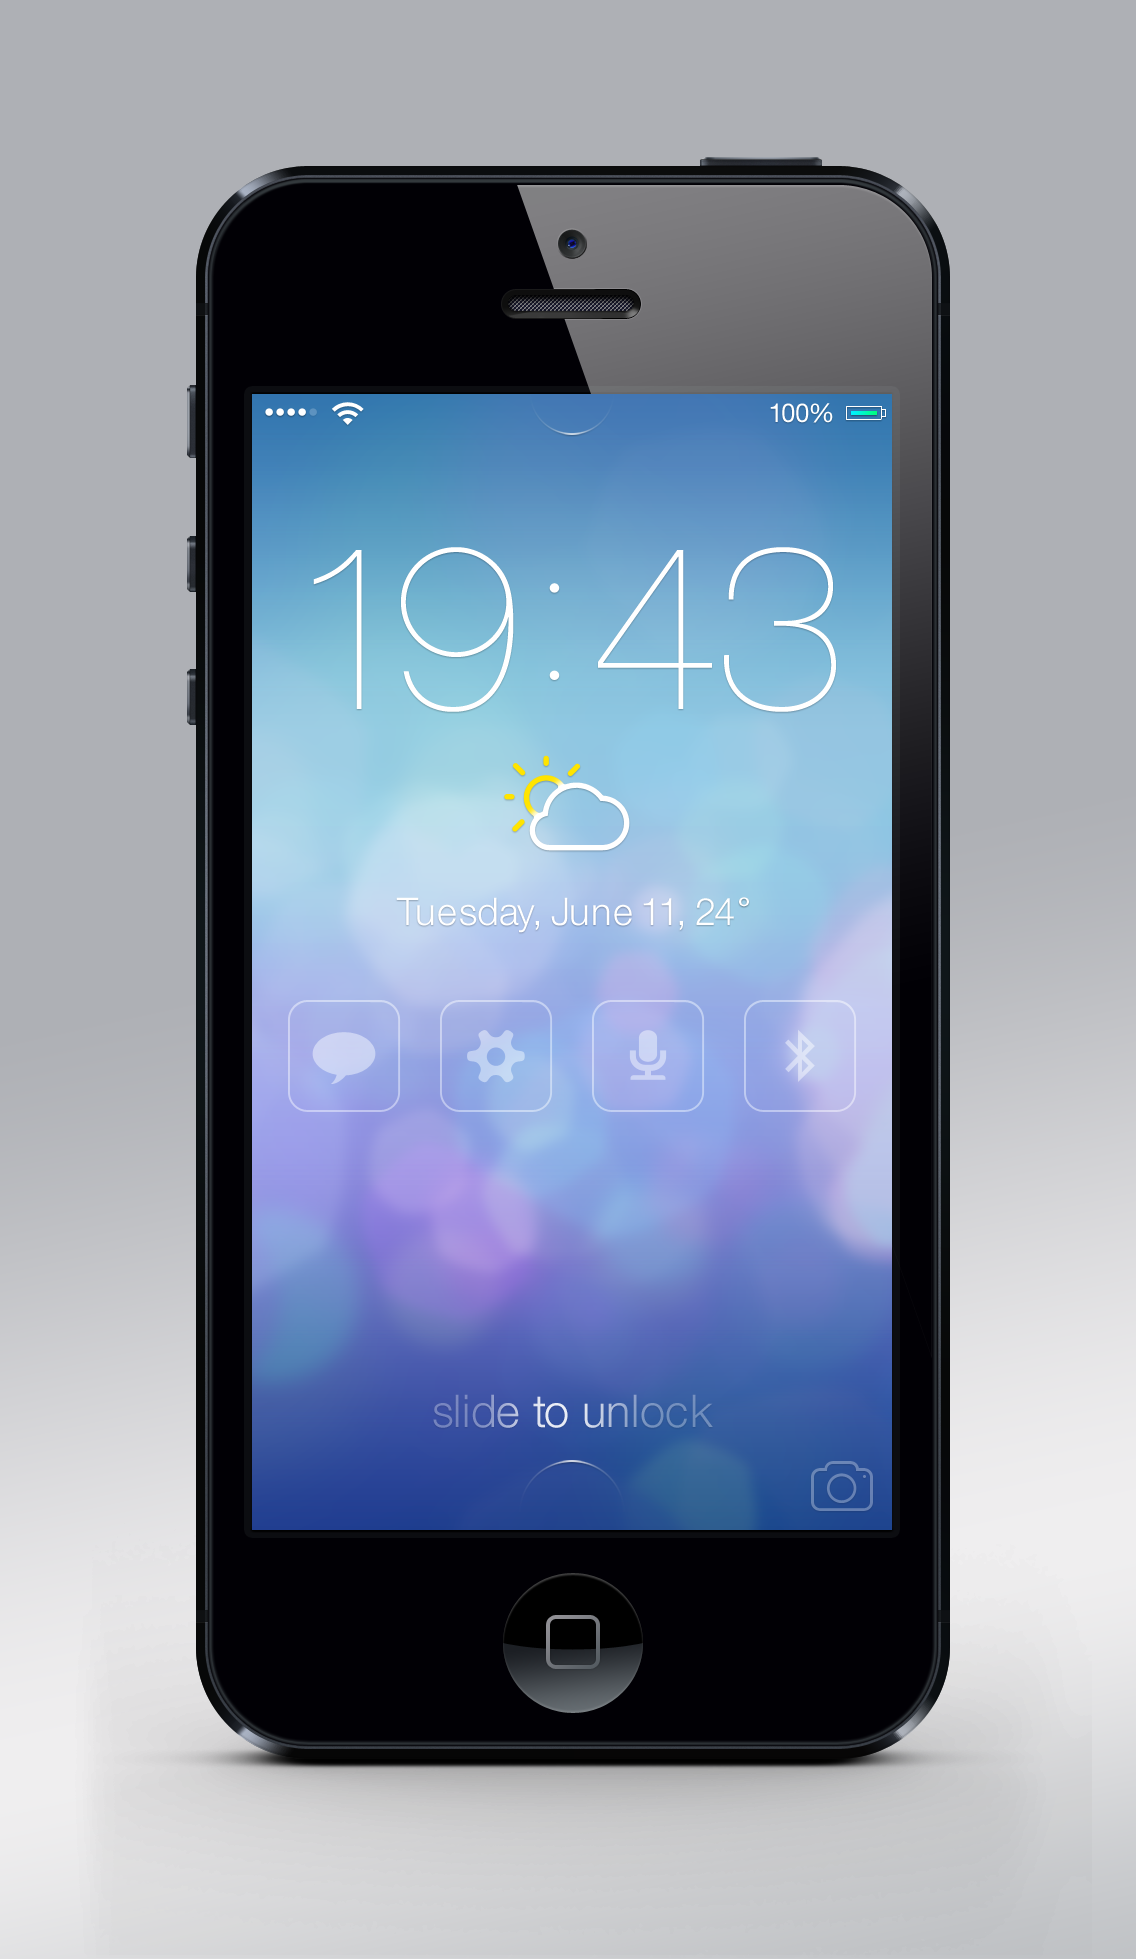 Ios7 redesign fullscreen